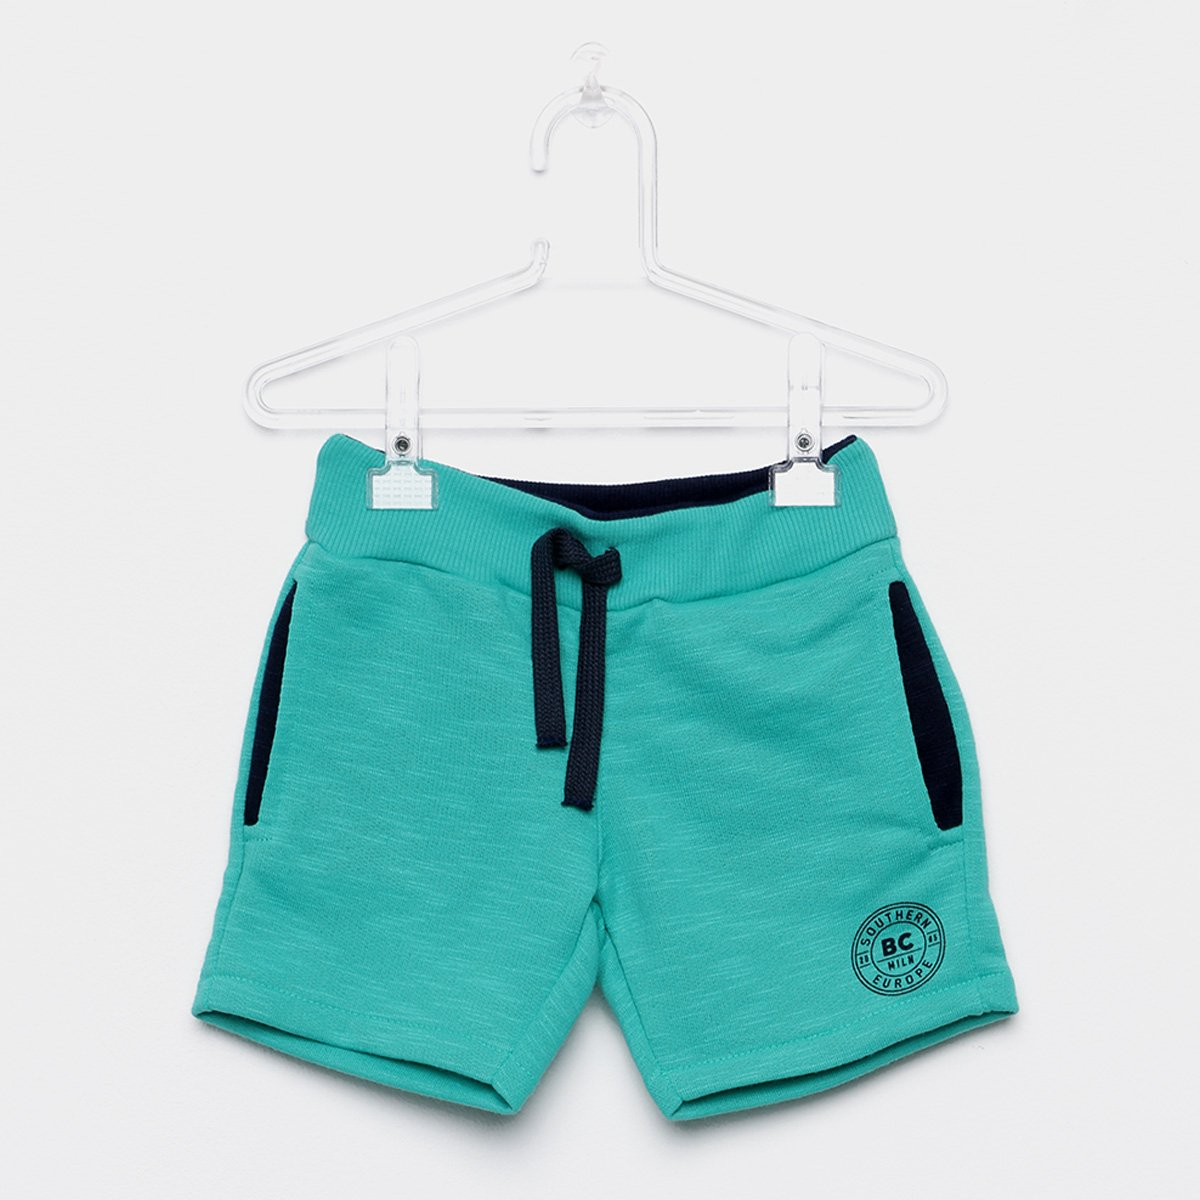 55d7d5df226749 Bermuda Infantil Milon Masculina - Tam: G - Shopping TudoAzul